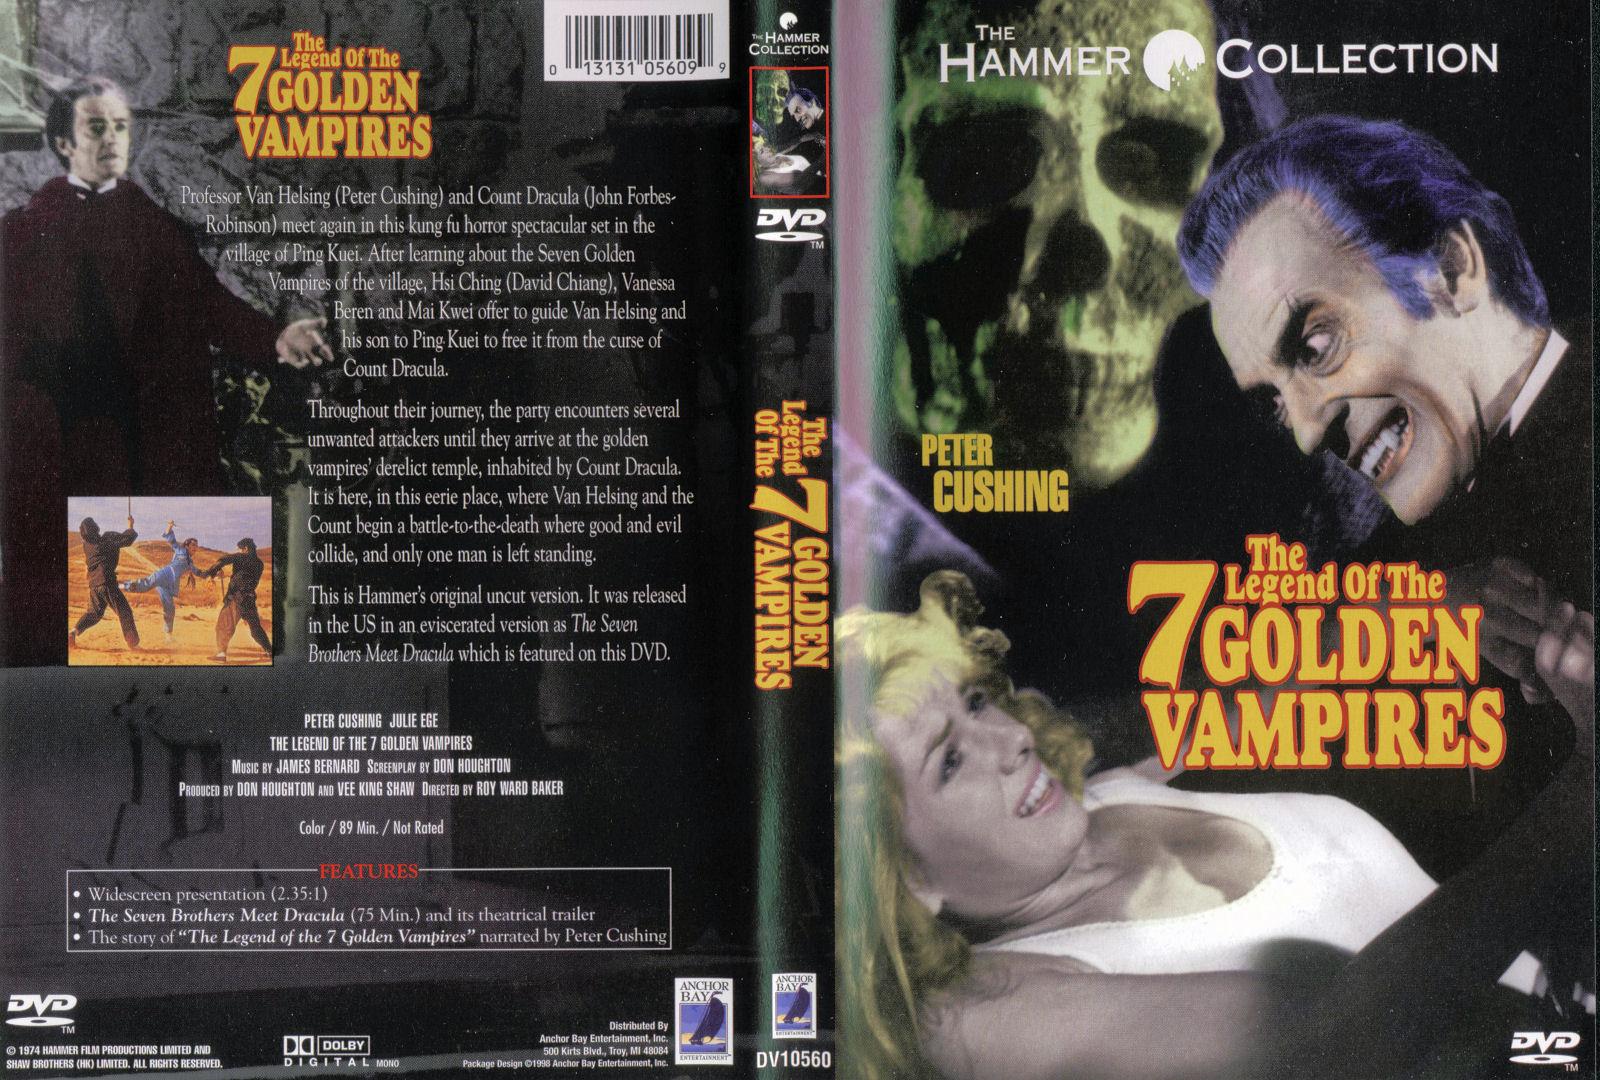 the legend of the 7 golden vampires 1974 u2013 horrorpedia